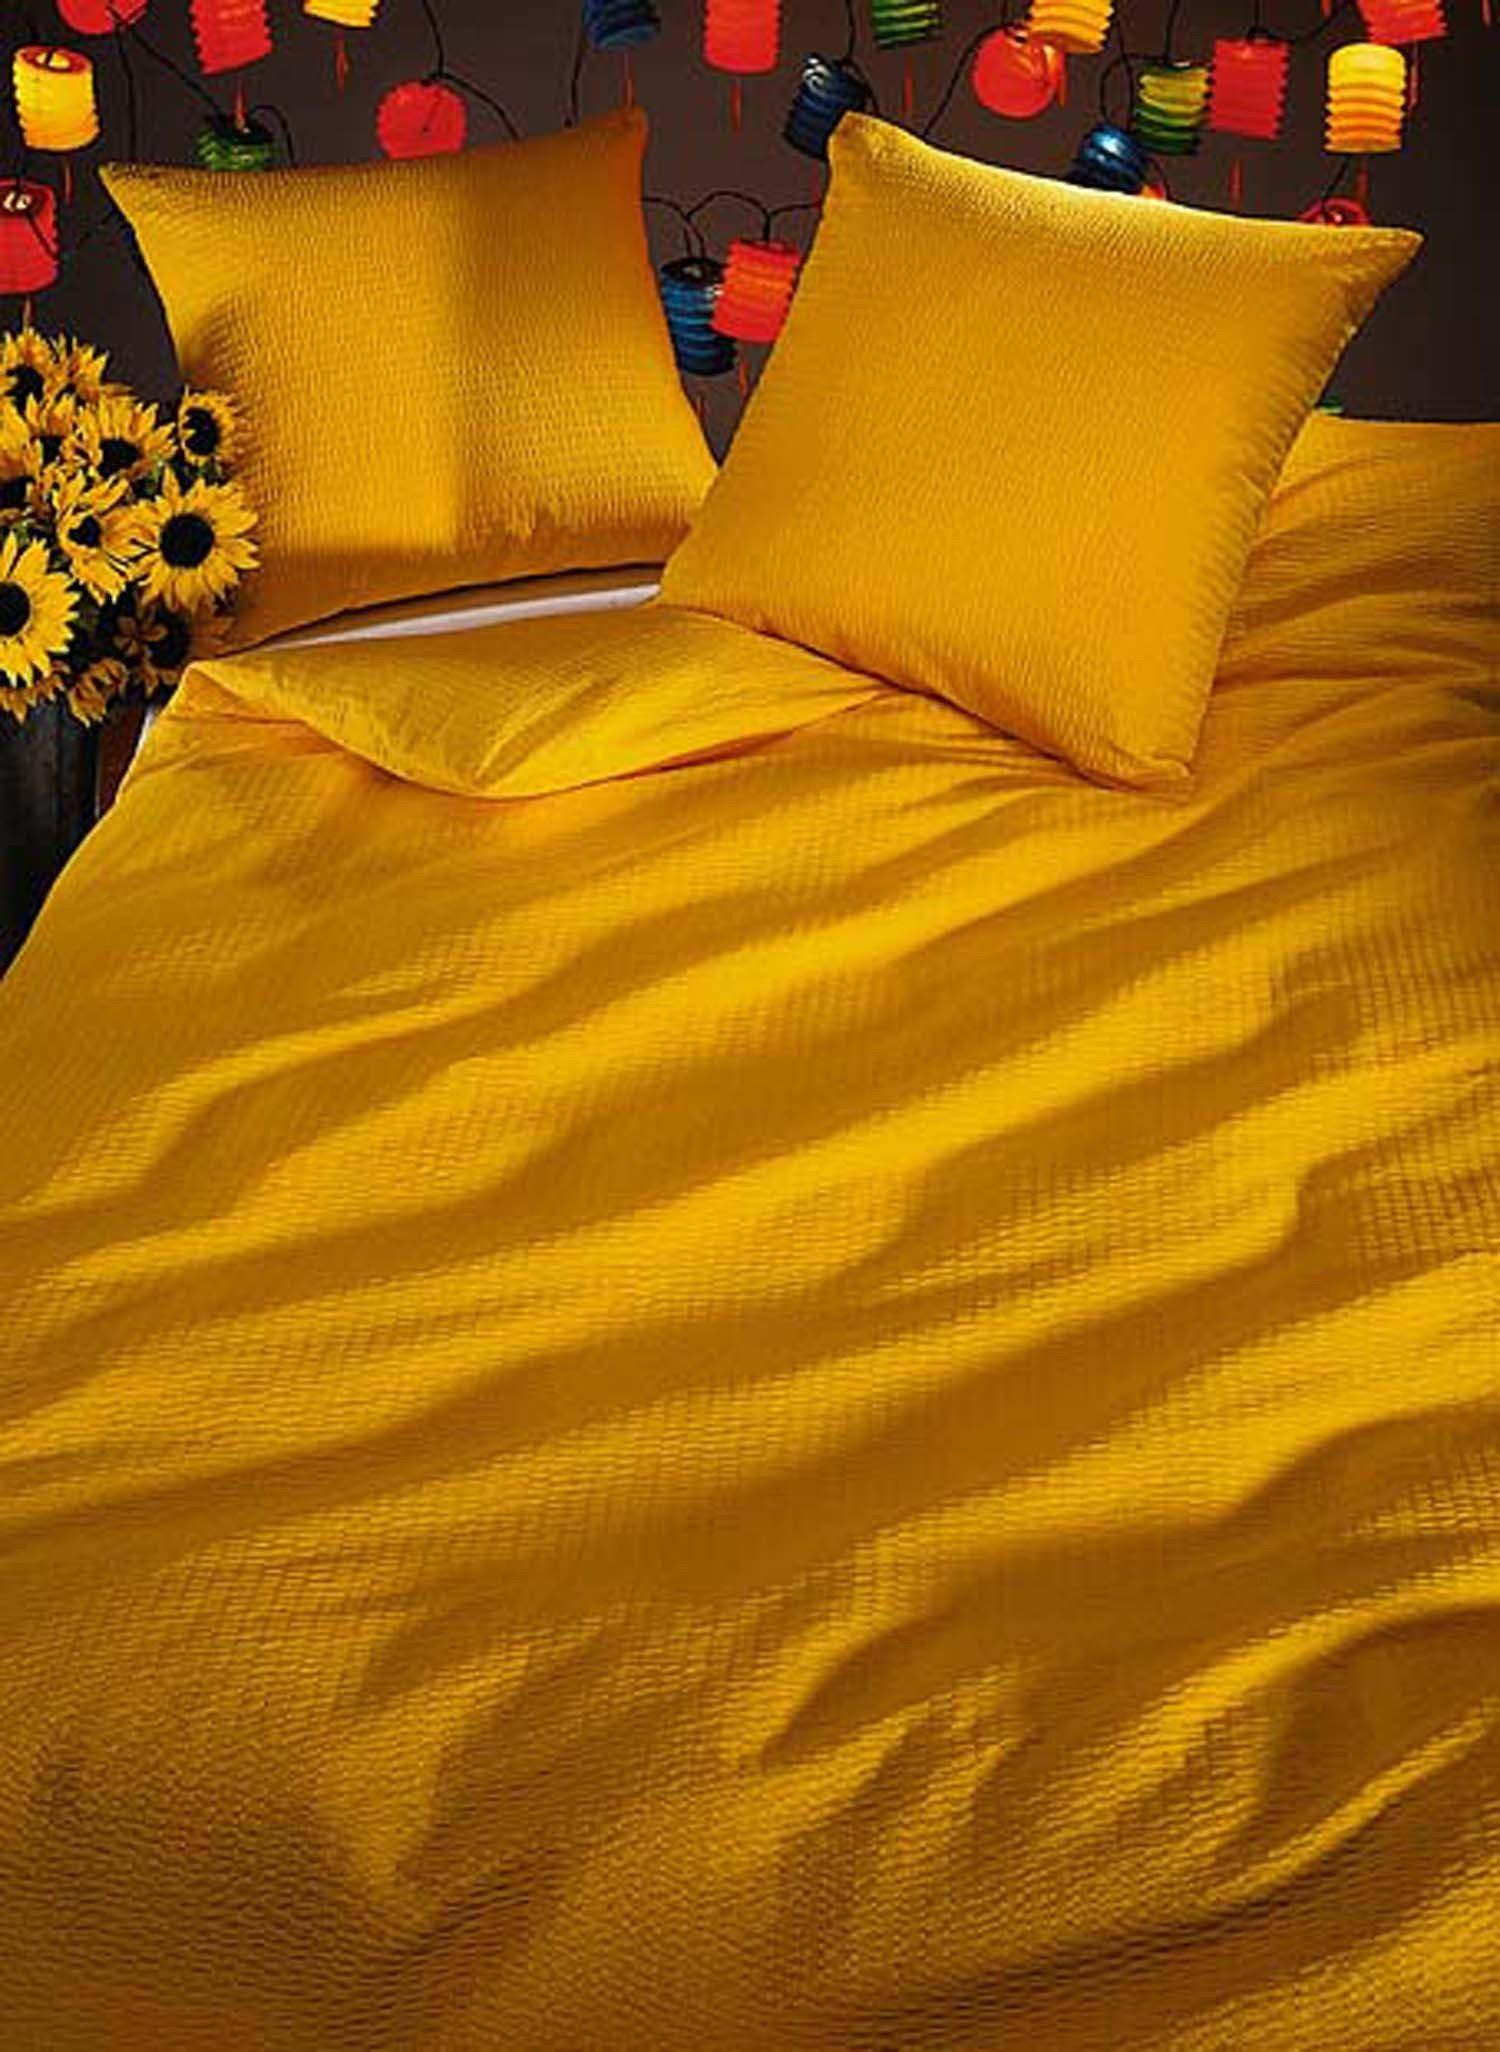 Garn.FS Seersucker gelb 2x65x65+200x210cm - 6 - Ronja.ch